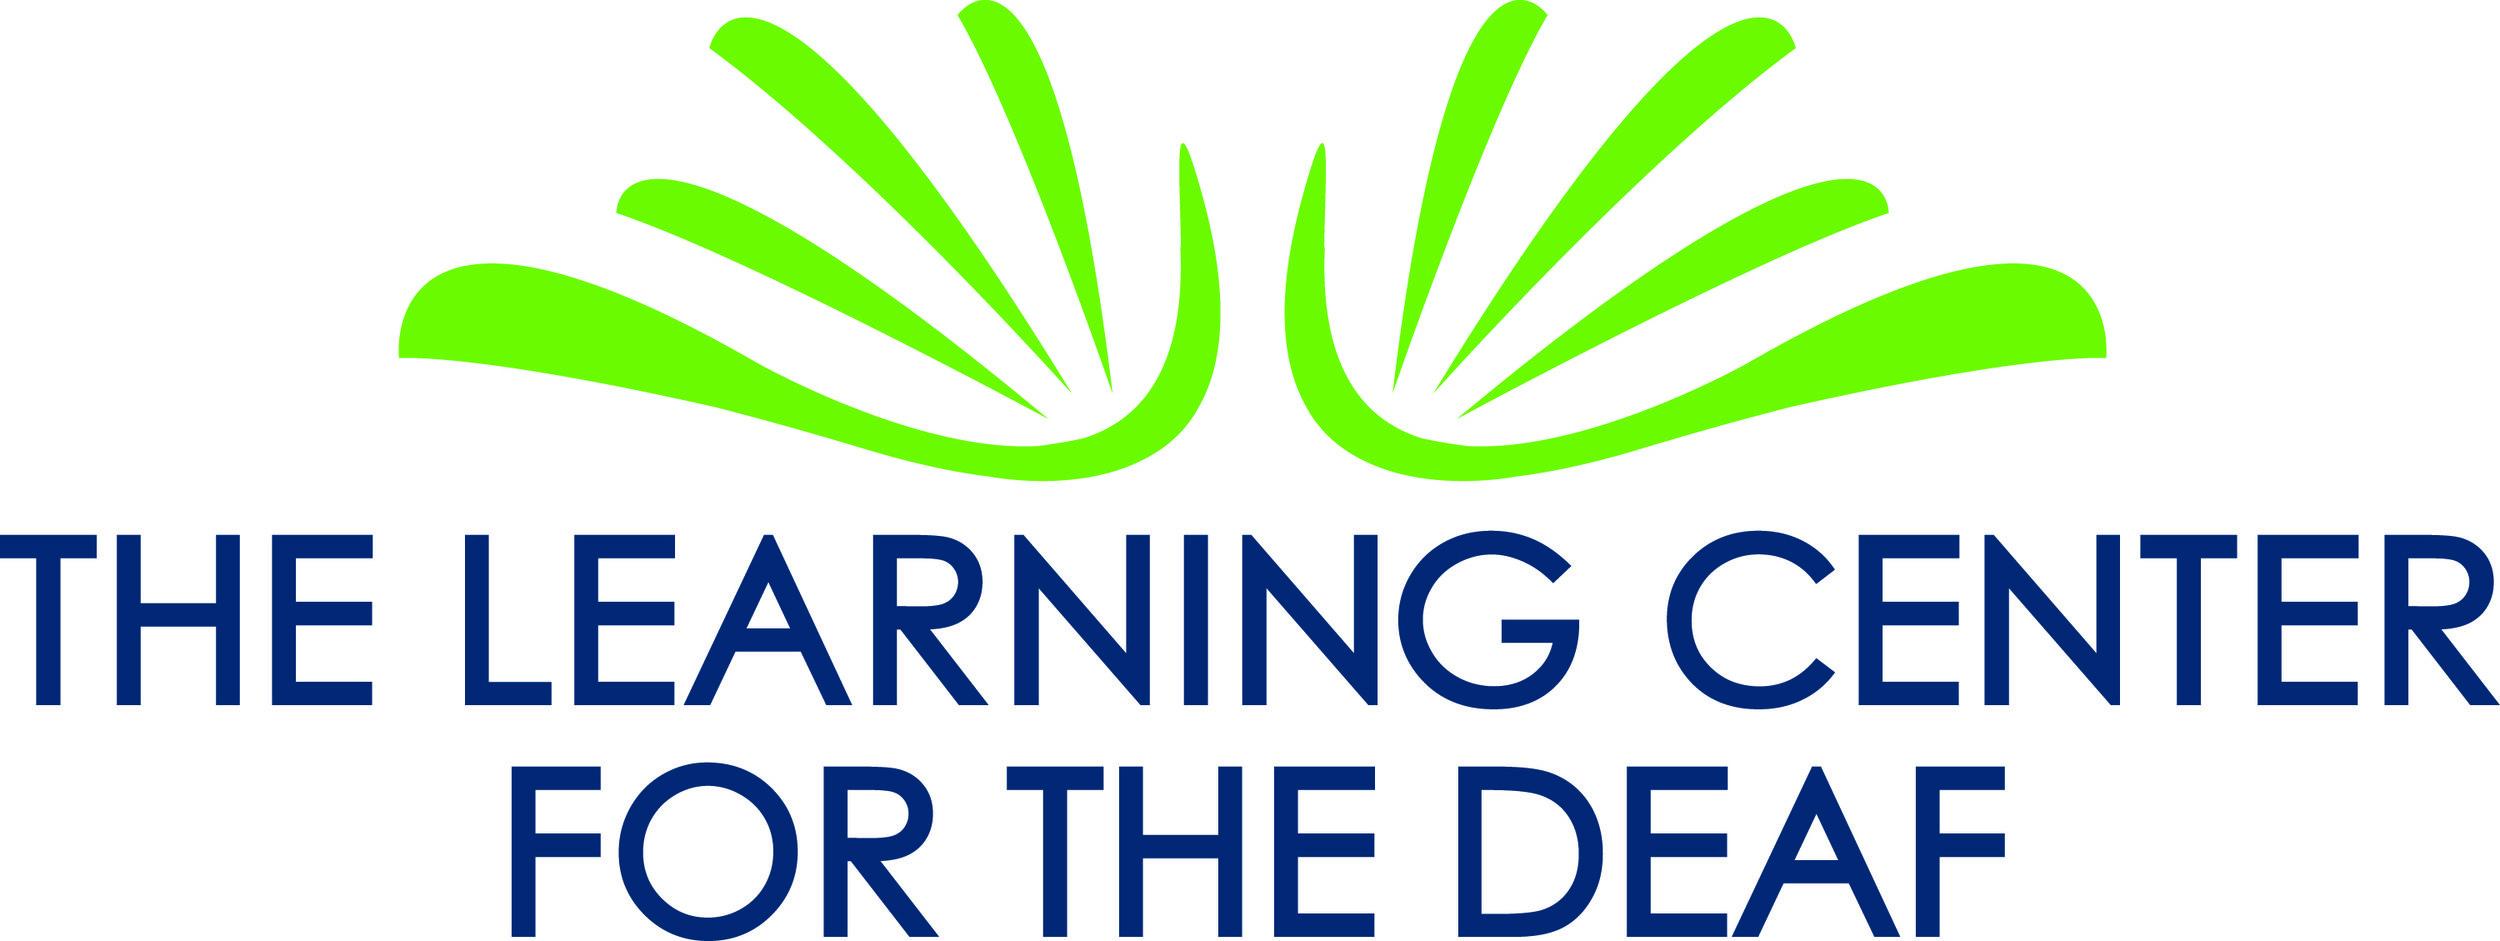 Learning Center for the Deaf